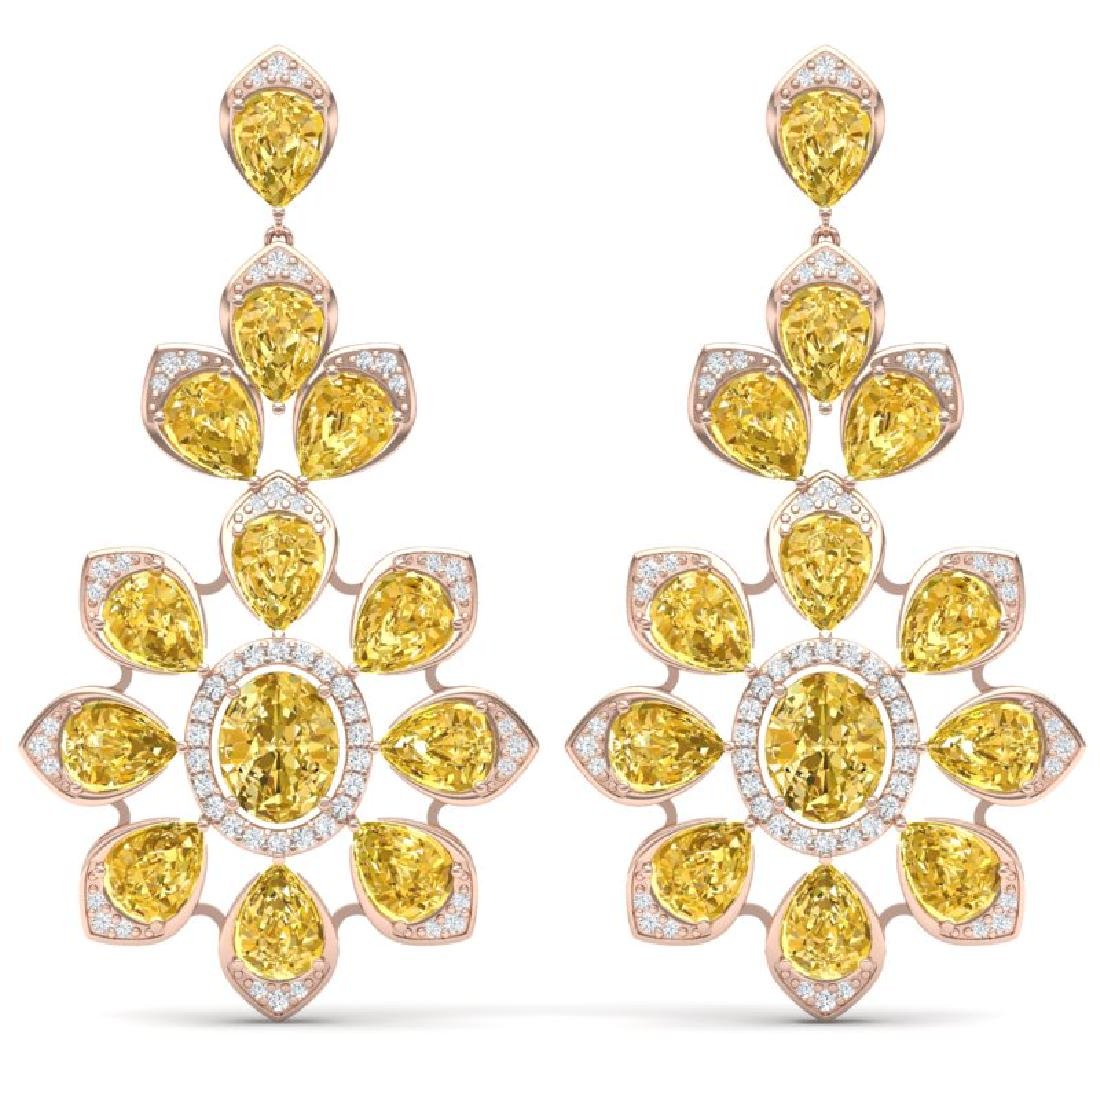 48.67 CTW Royalty Canary Citrine & VS Diamond Earrings